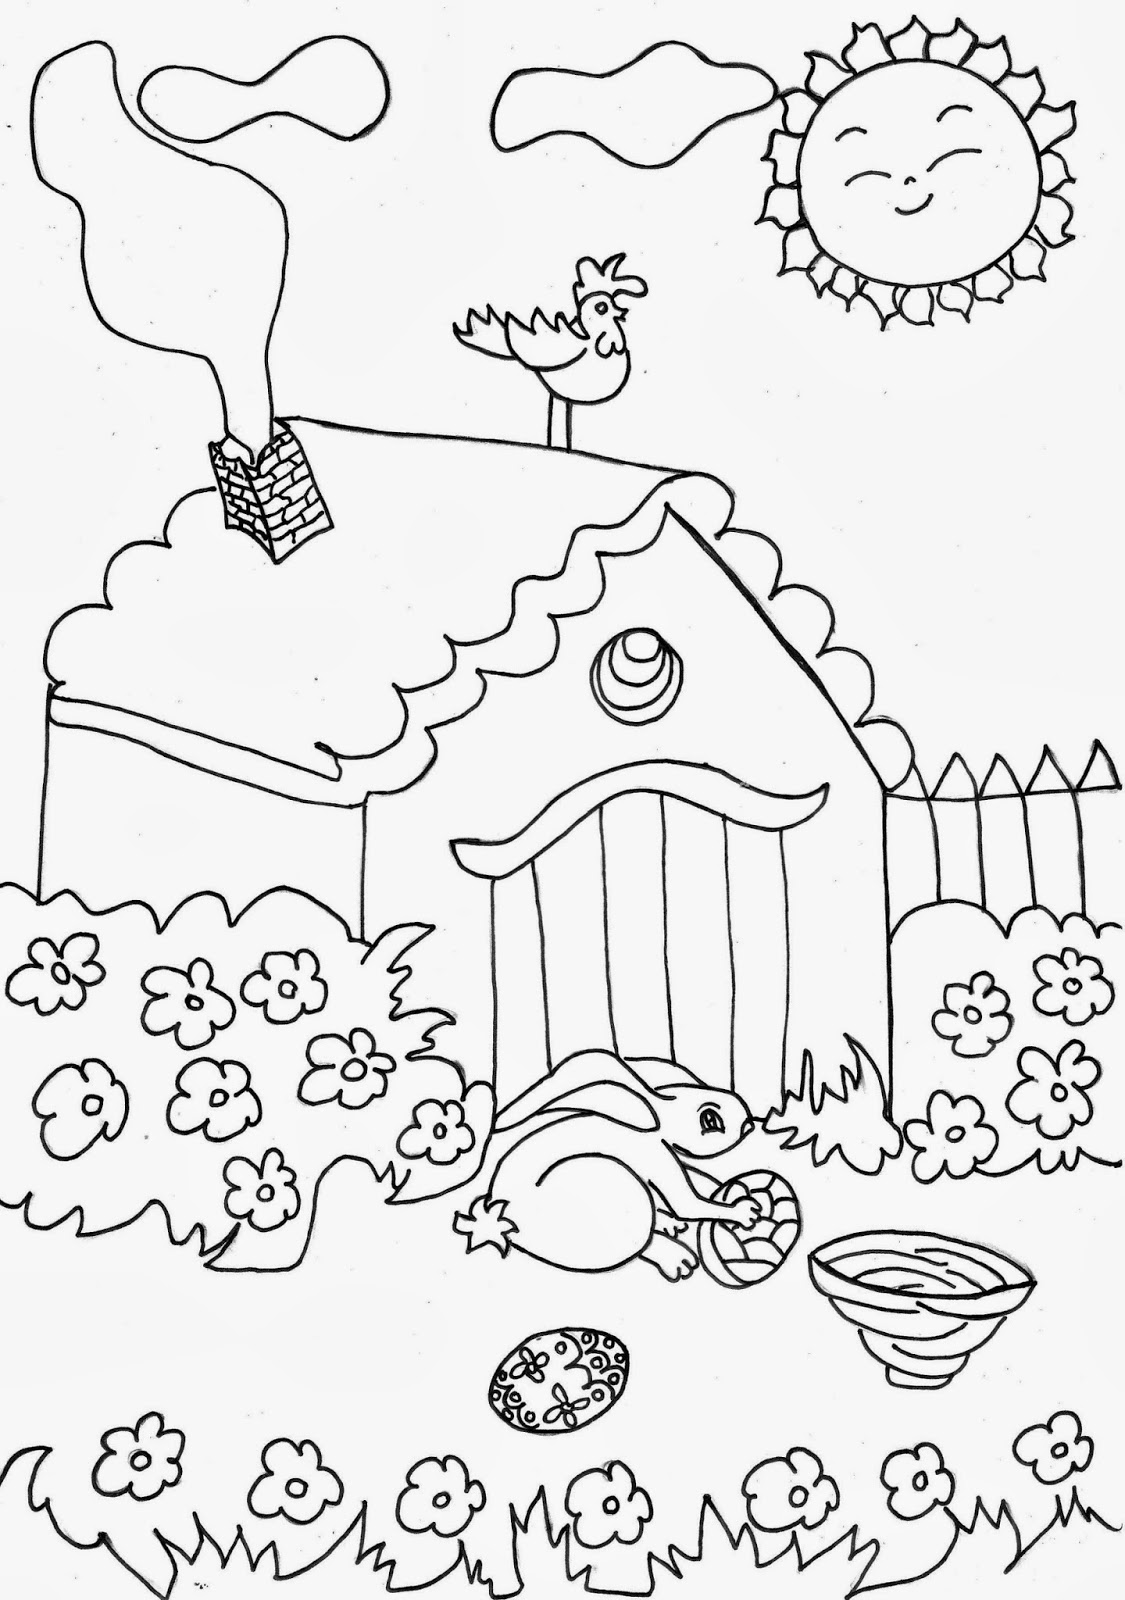 Dibujo Y Coloreo Mi Jardin Infantil Para Niños Imagui